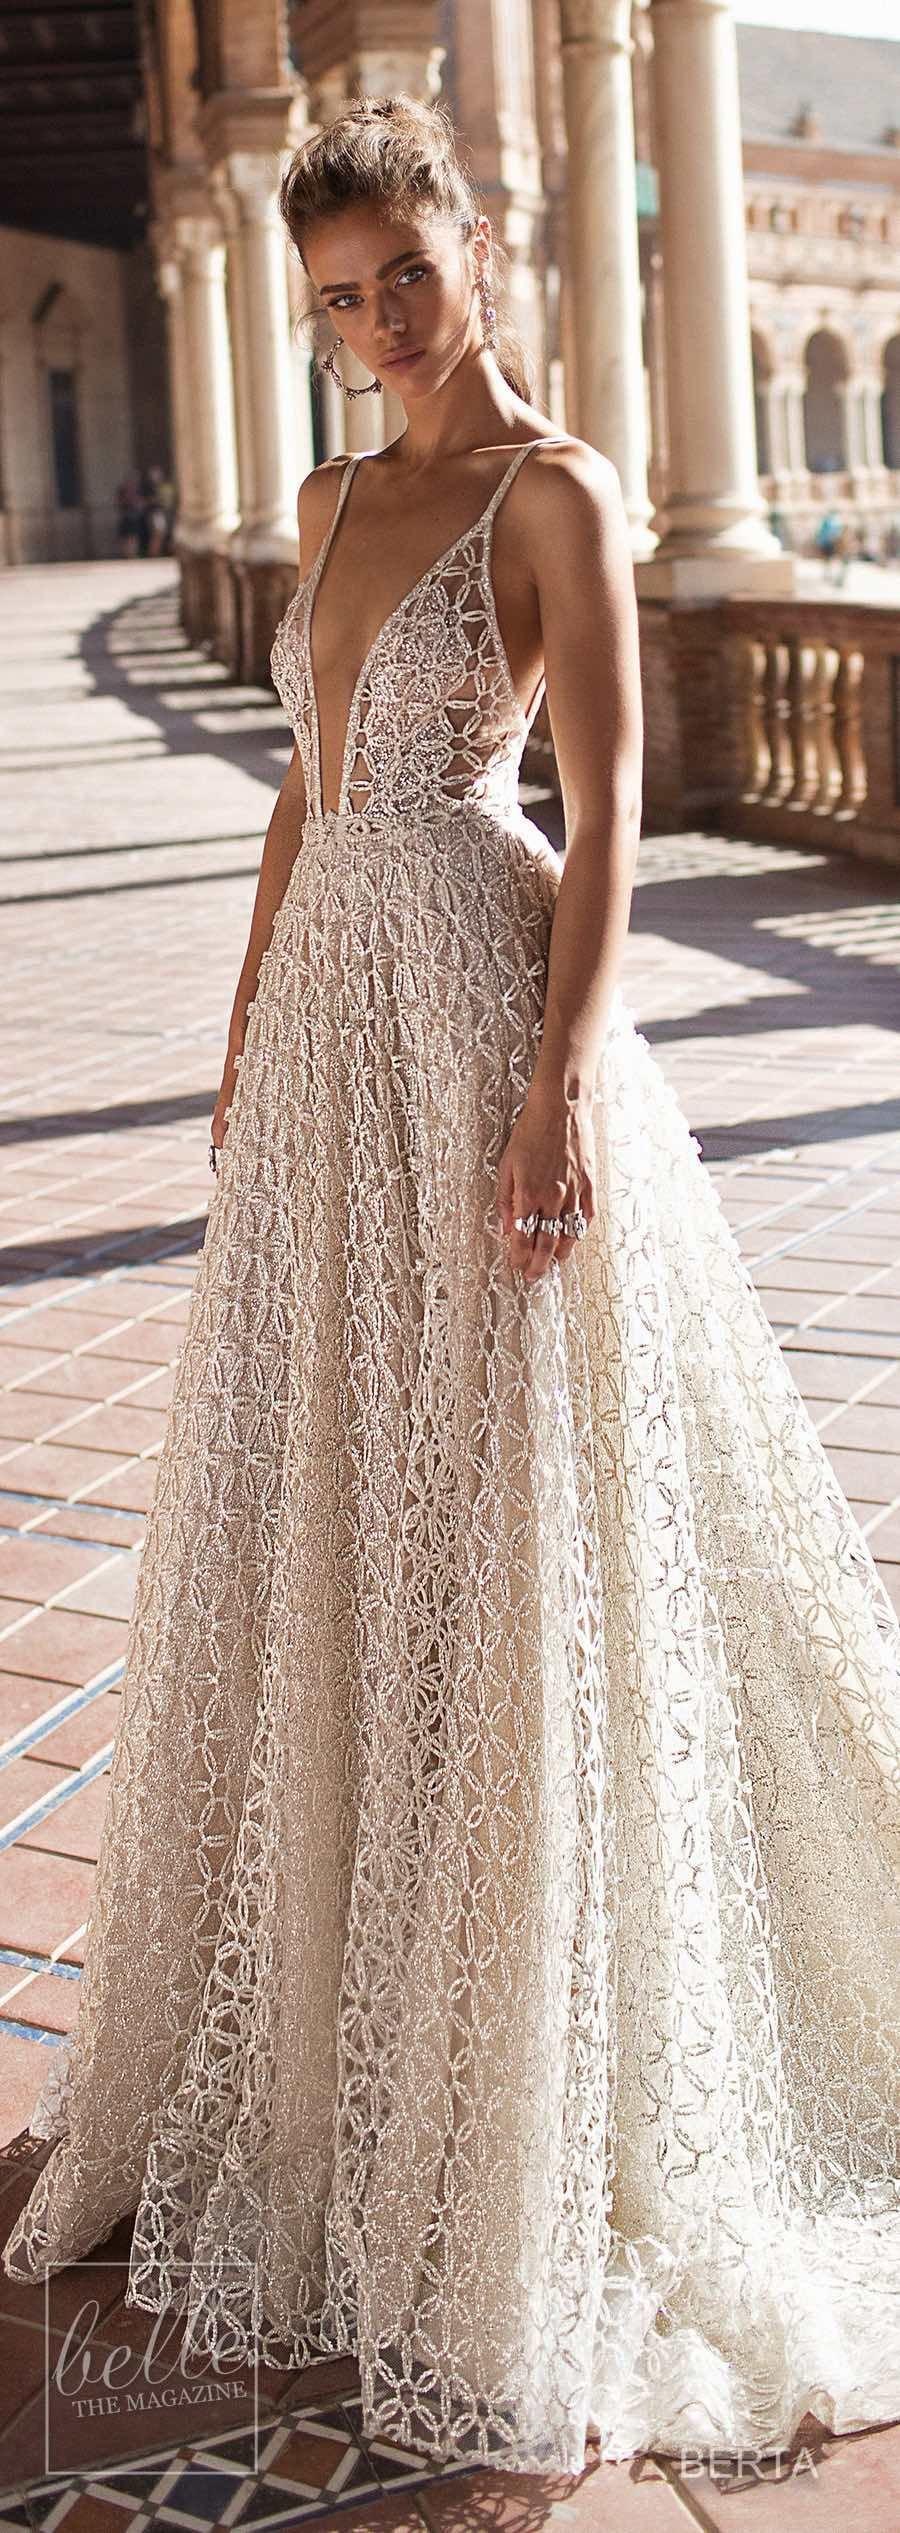 Berta seville wedding dress collection weddingdress bridalgown